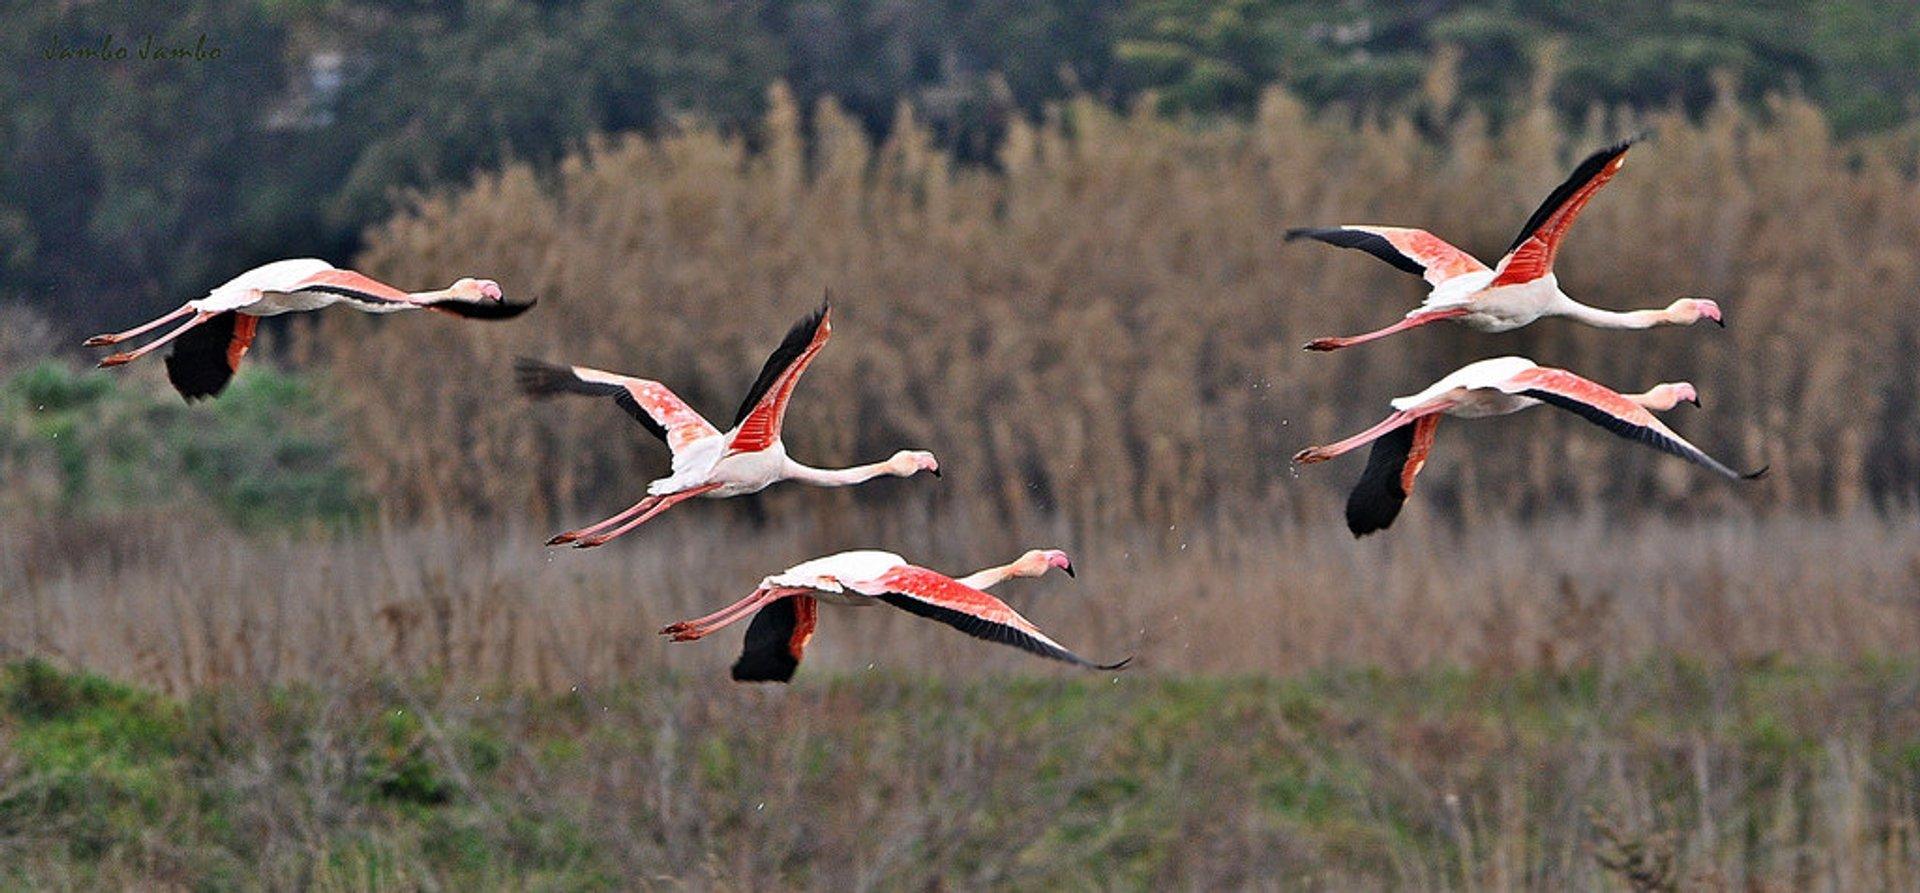 Birdwatching  in Tuscany - Best Season 2020